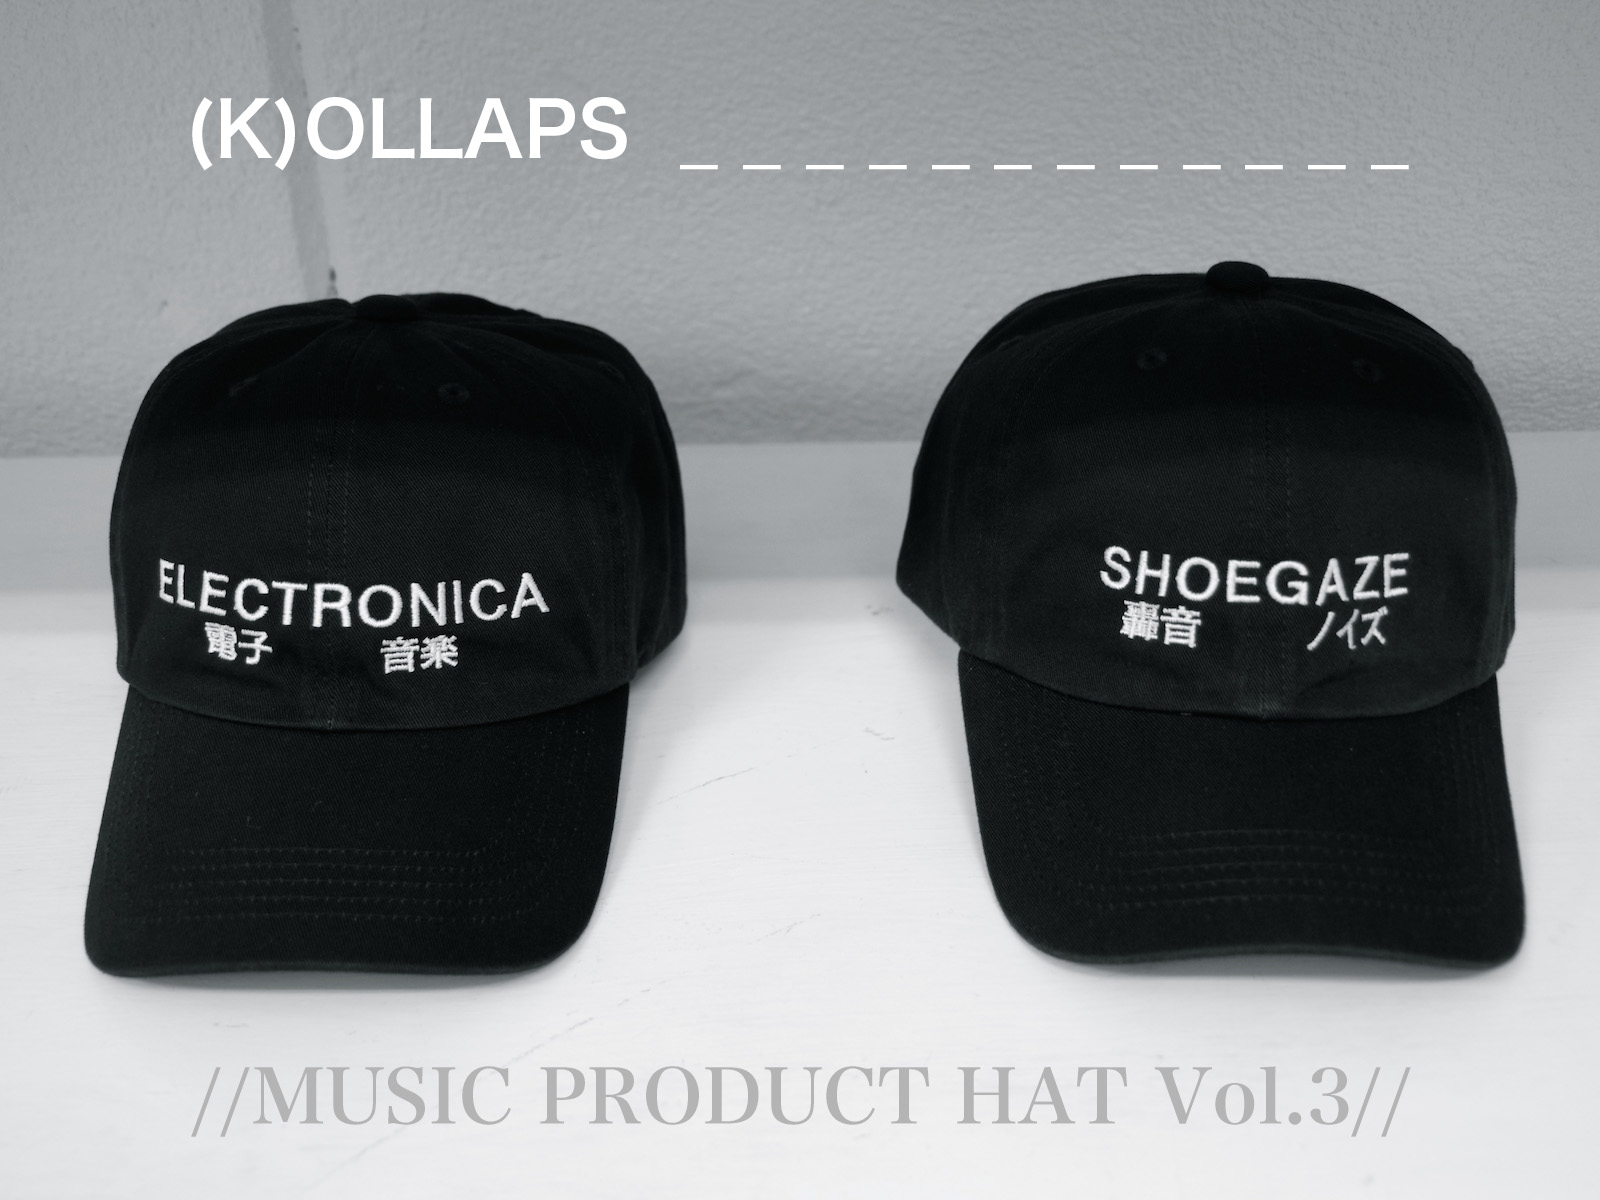 (K)OLLAPS MUSIC PRODUCT HAT Vol.3 販売開始